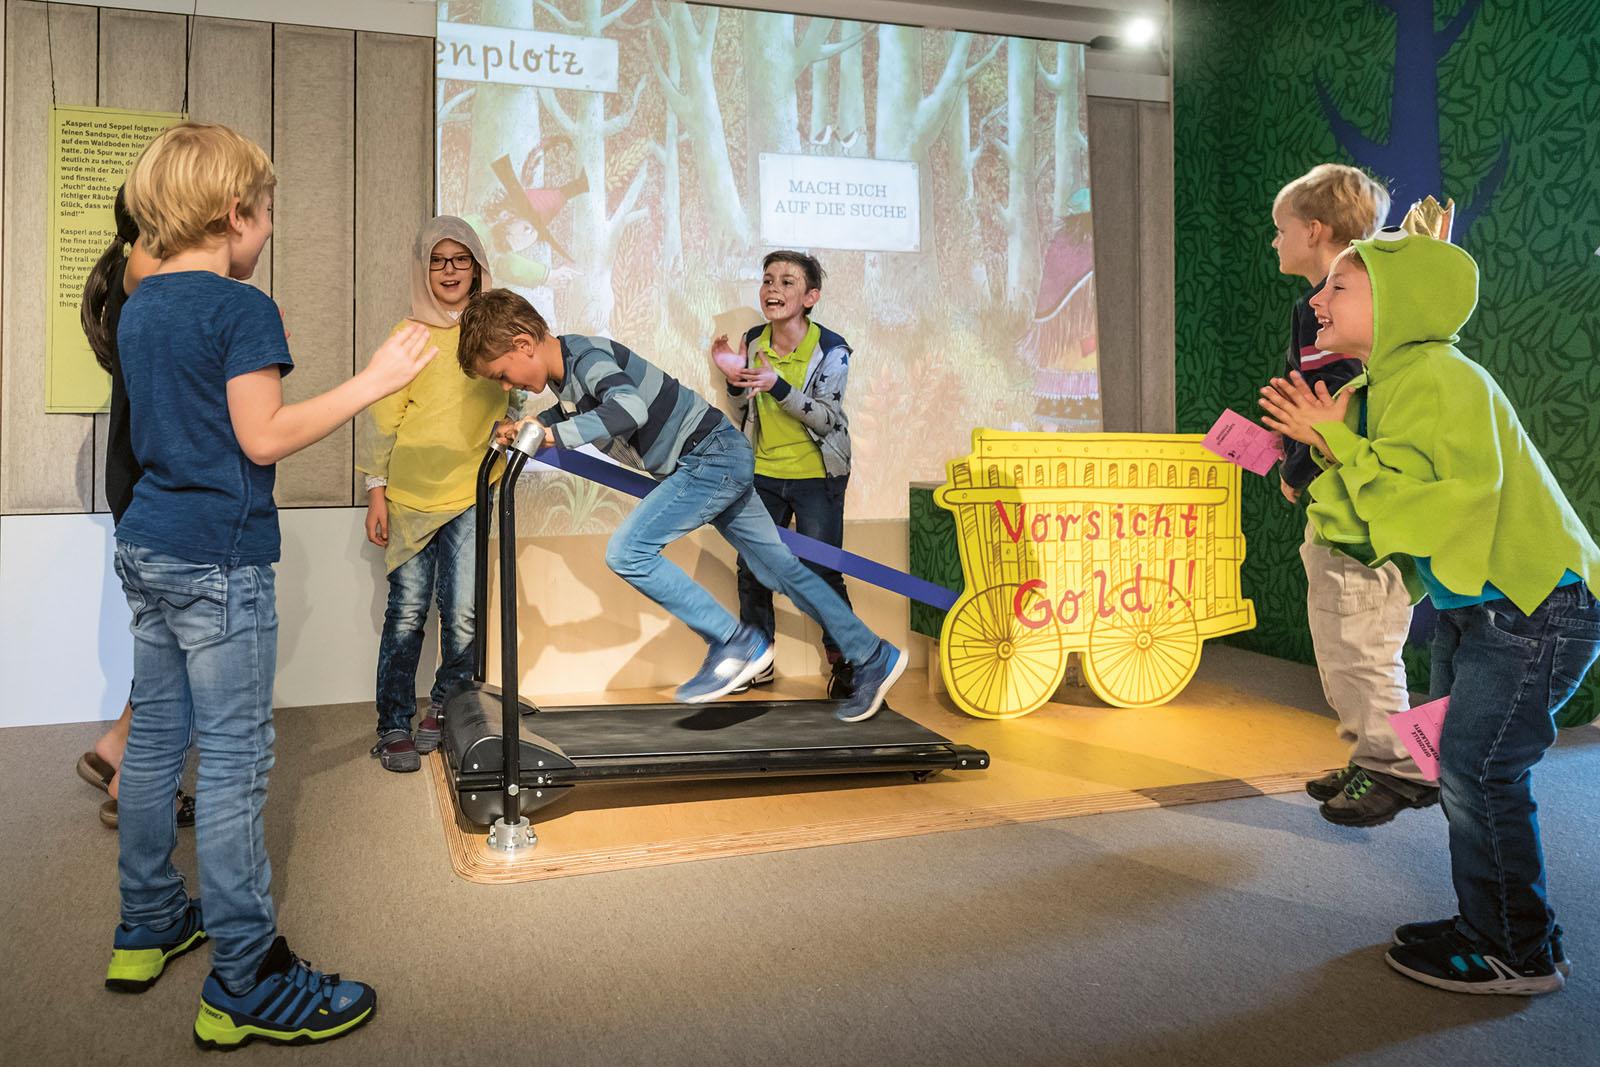 Lange Nacht der Museen Stuttgart - Junges Schloss Mitmachausstellung